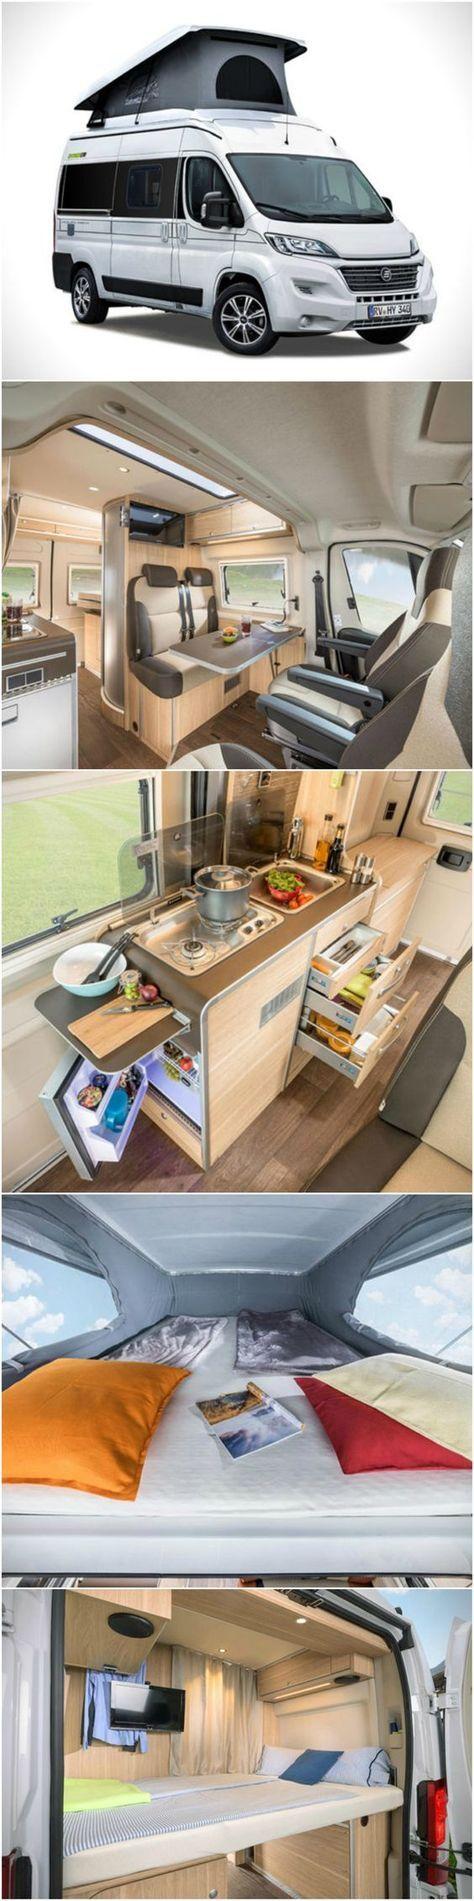 Rock Adventure Van: Leisure vehicle with bathroom